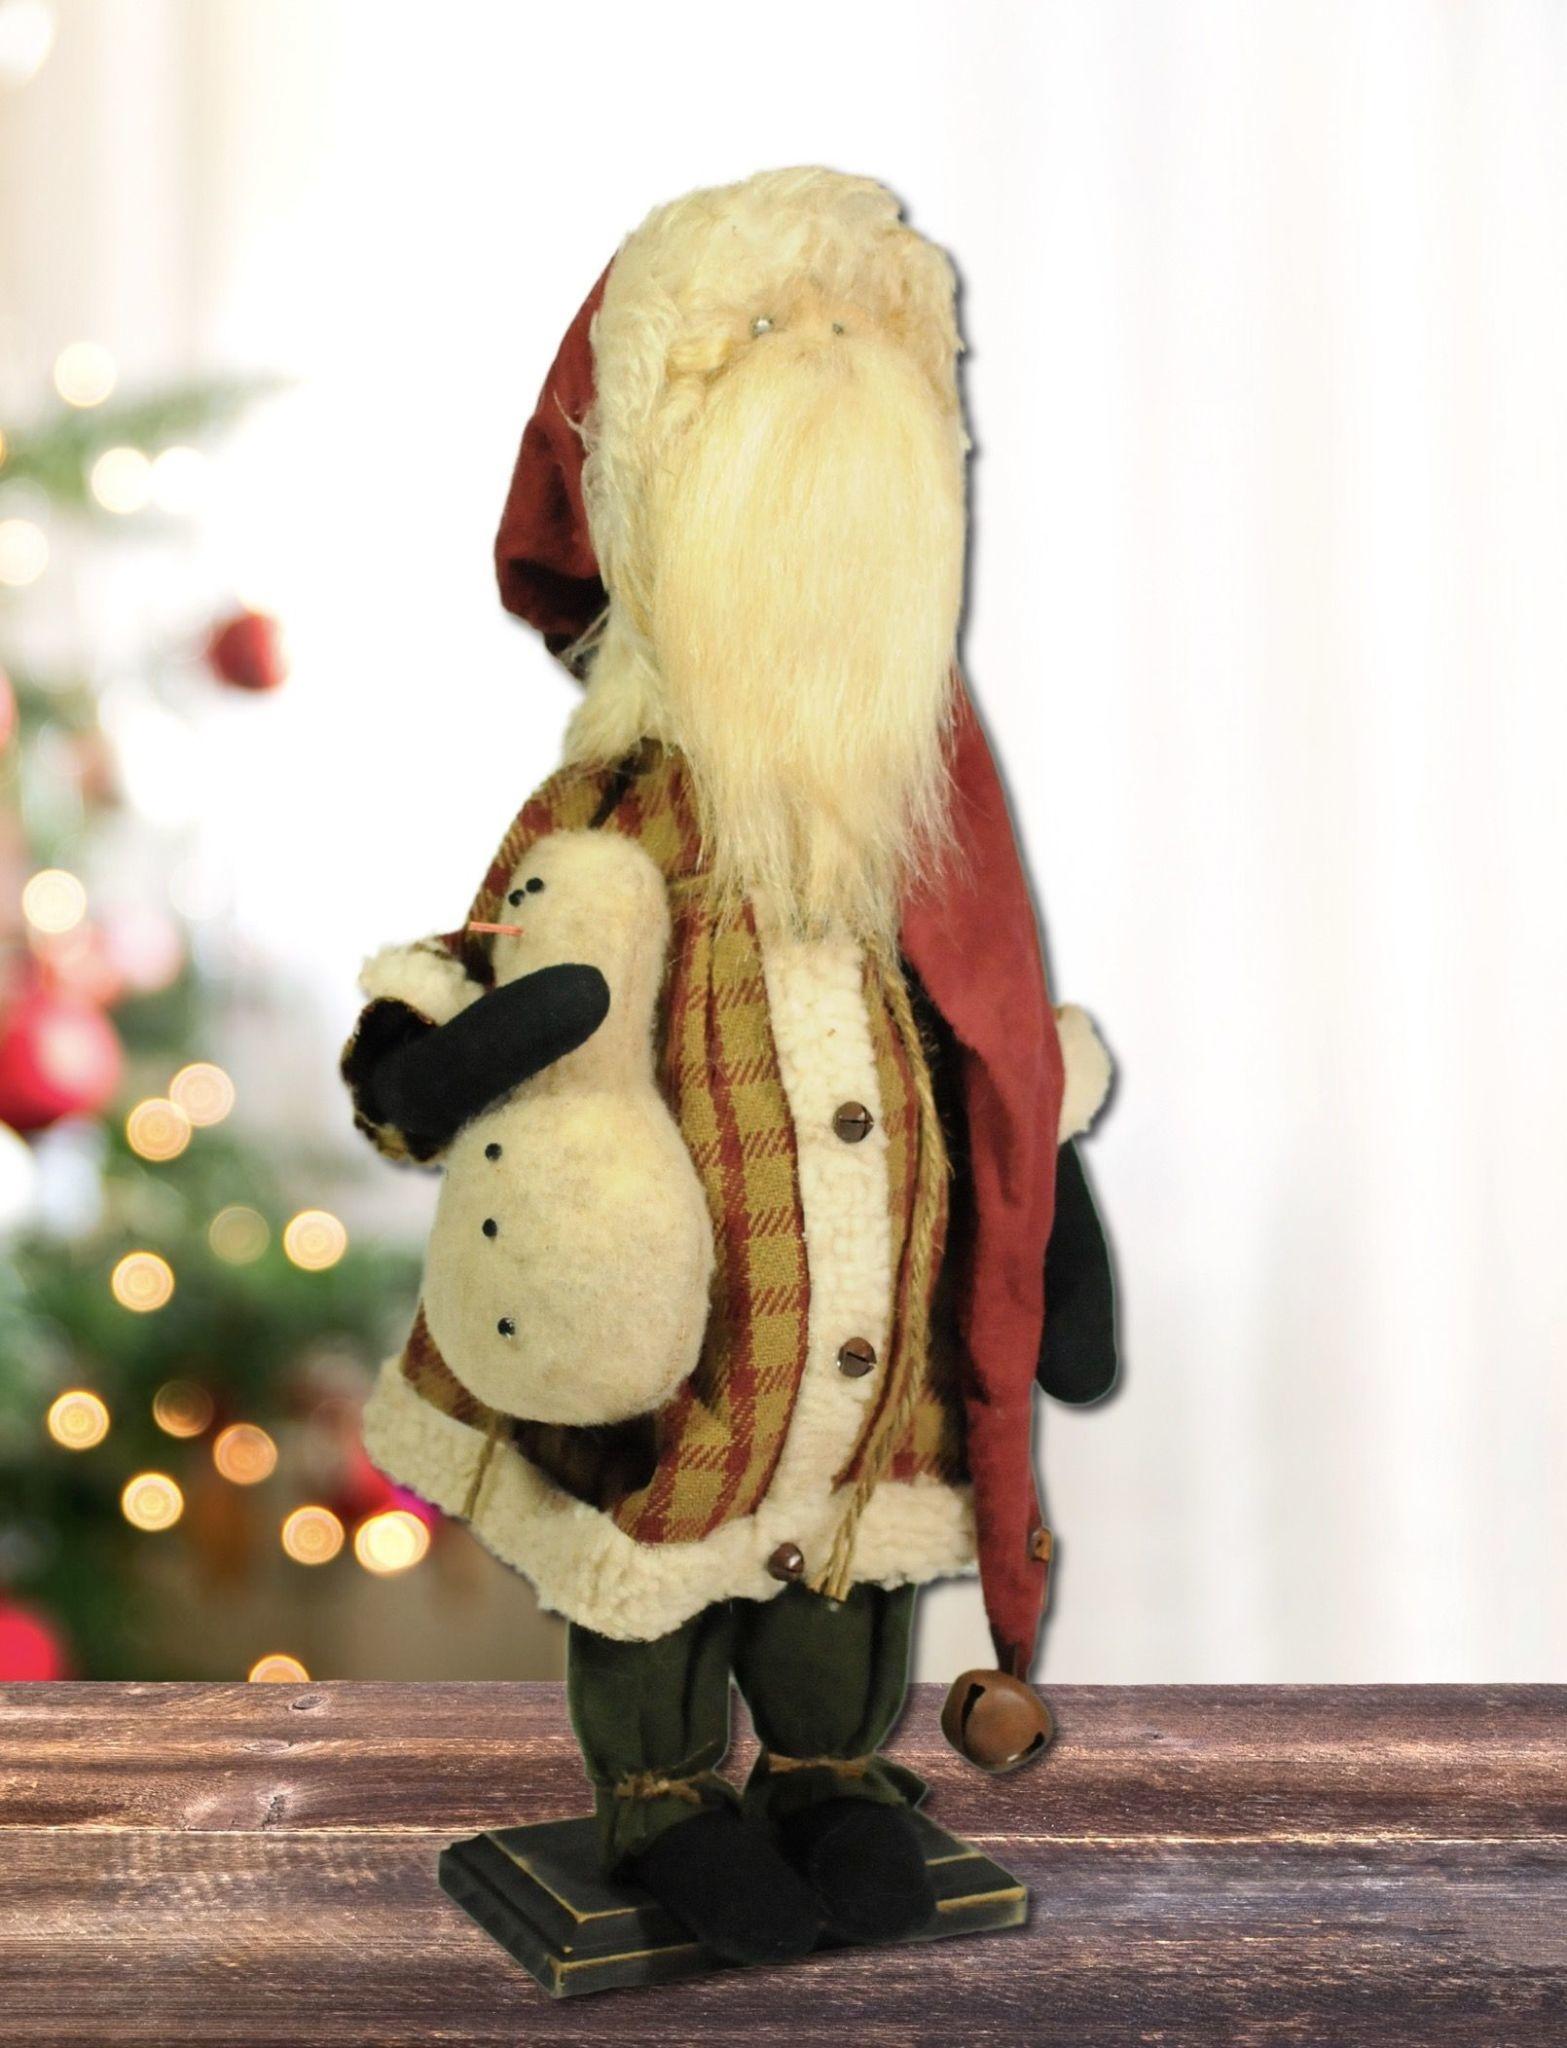 Nana's Farmhouse Santa Tan & Red Check Suit Holding Snowman